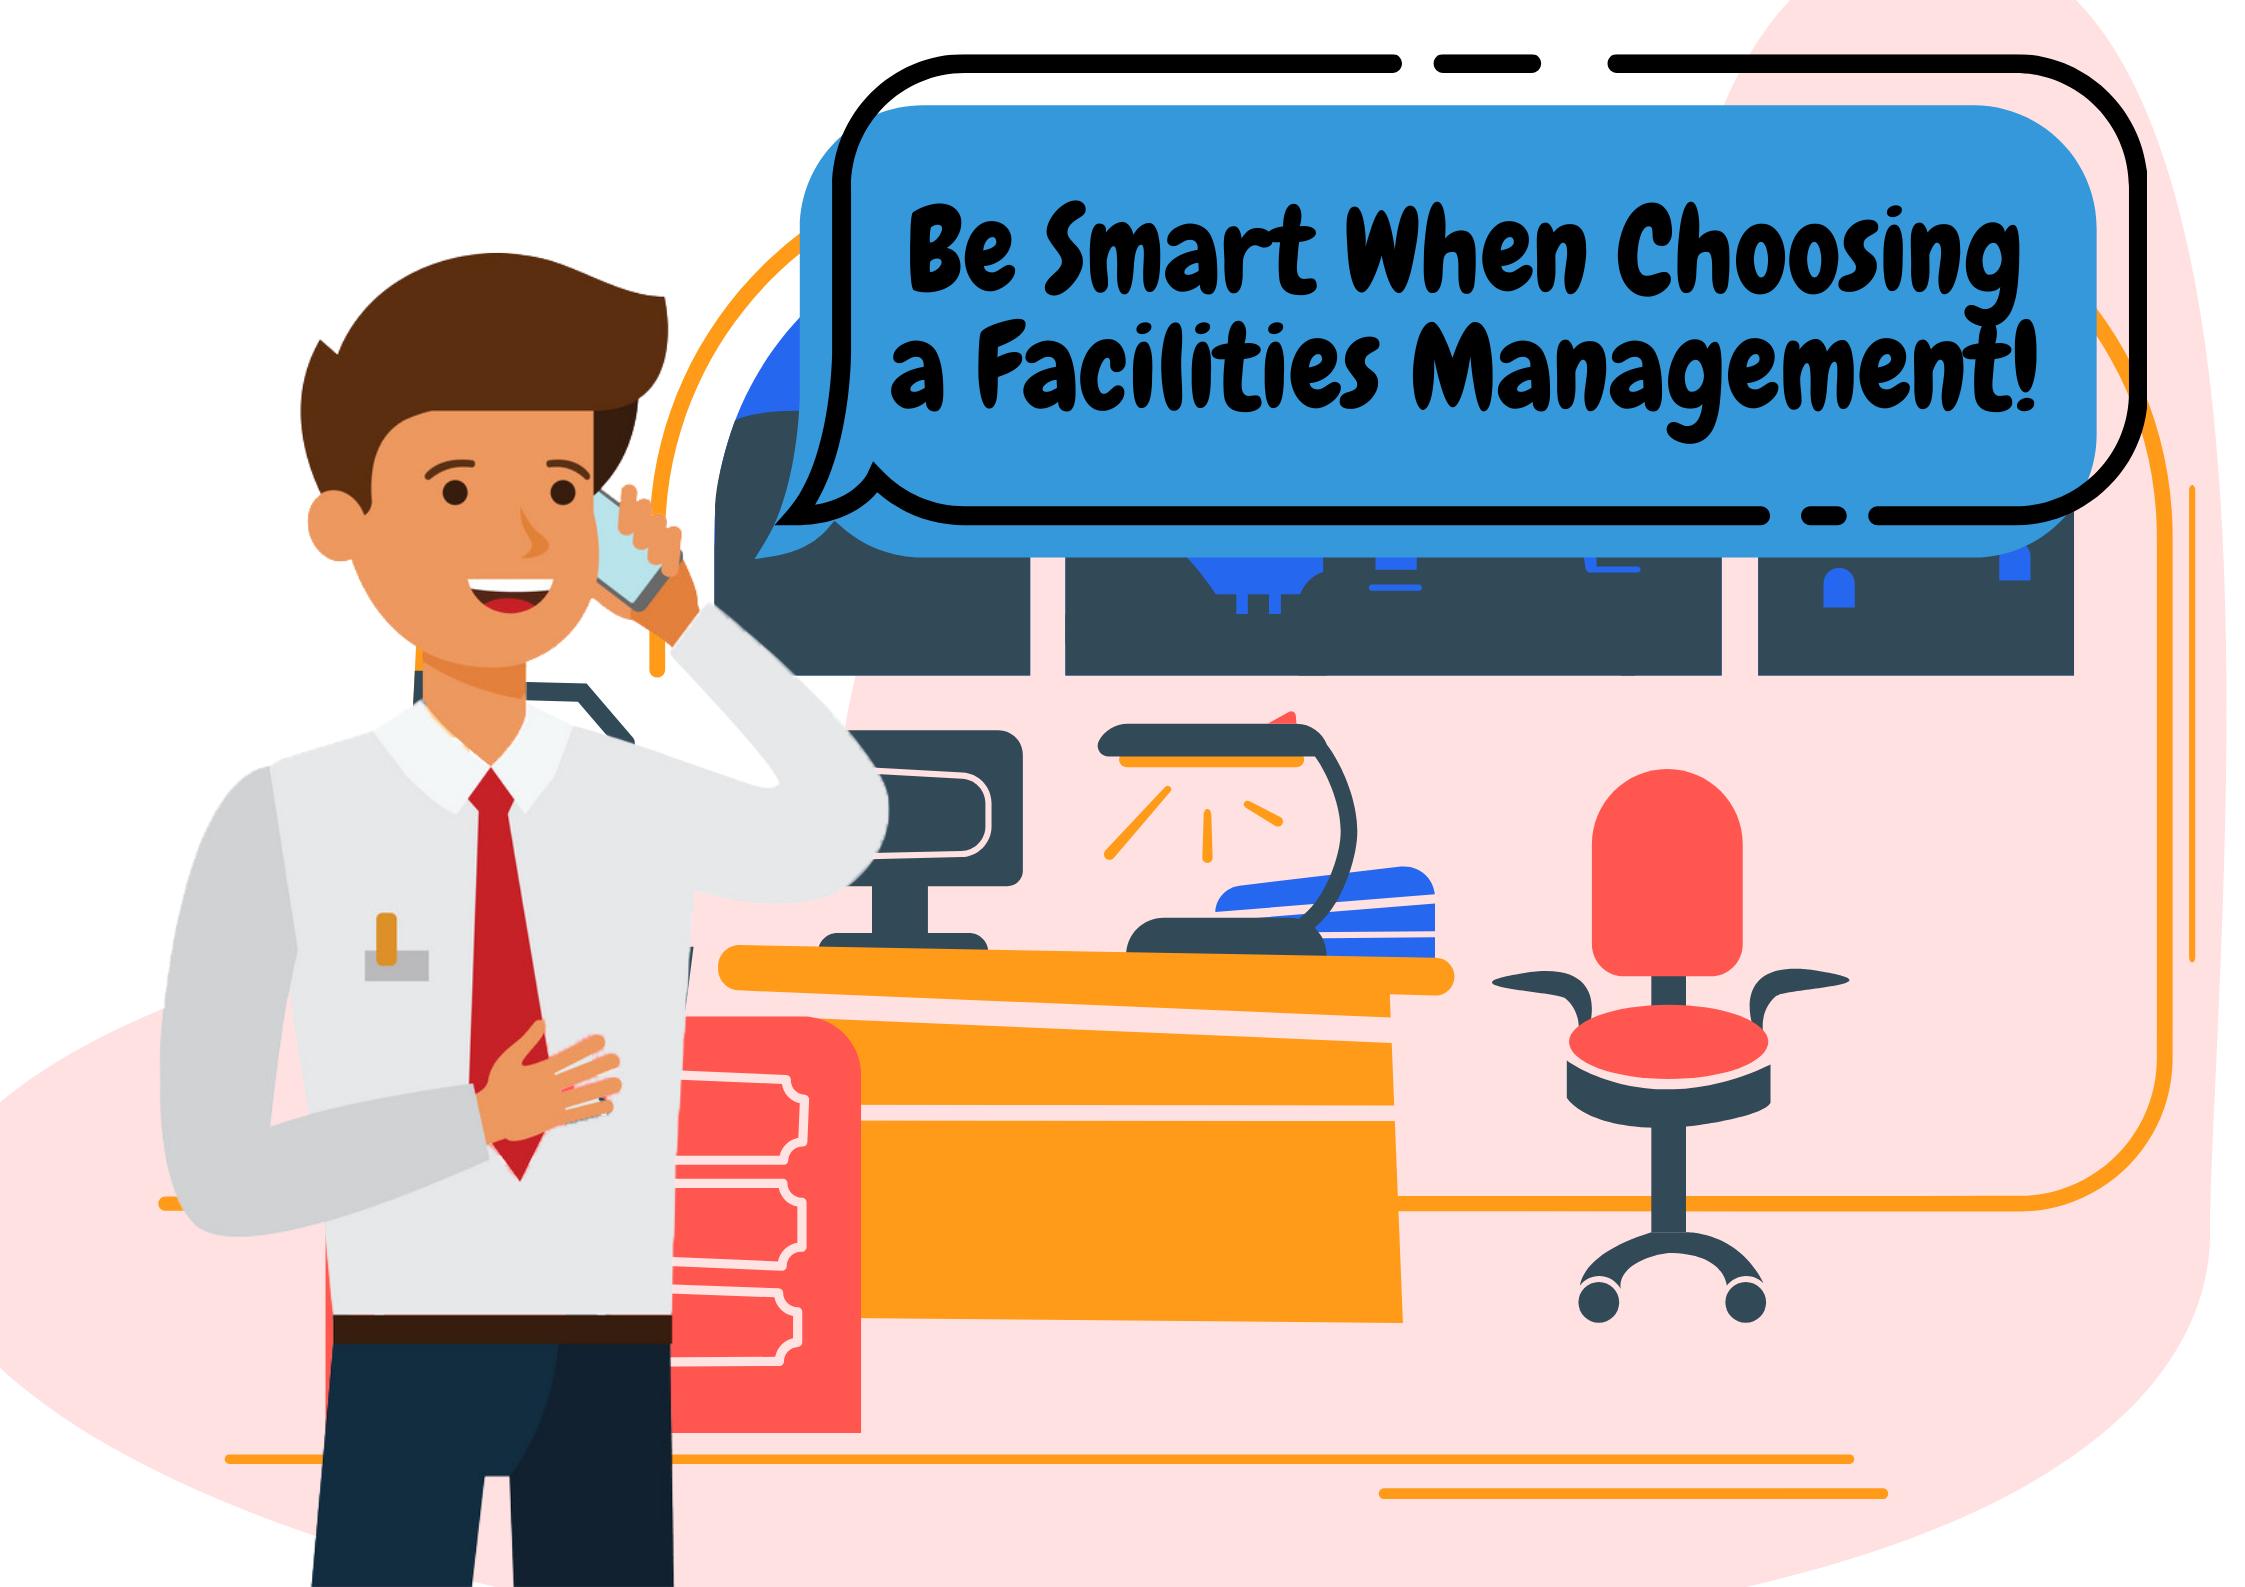 Be-Smart-When-Choosing-a-Facilities-Management